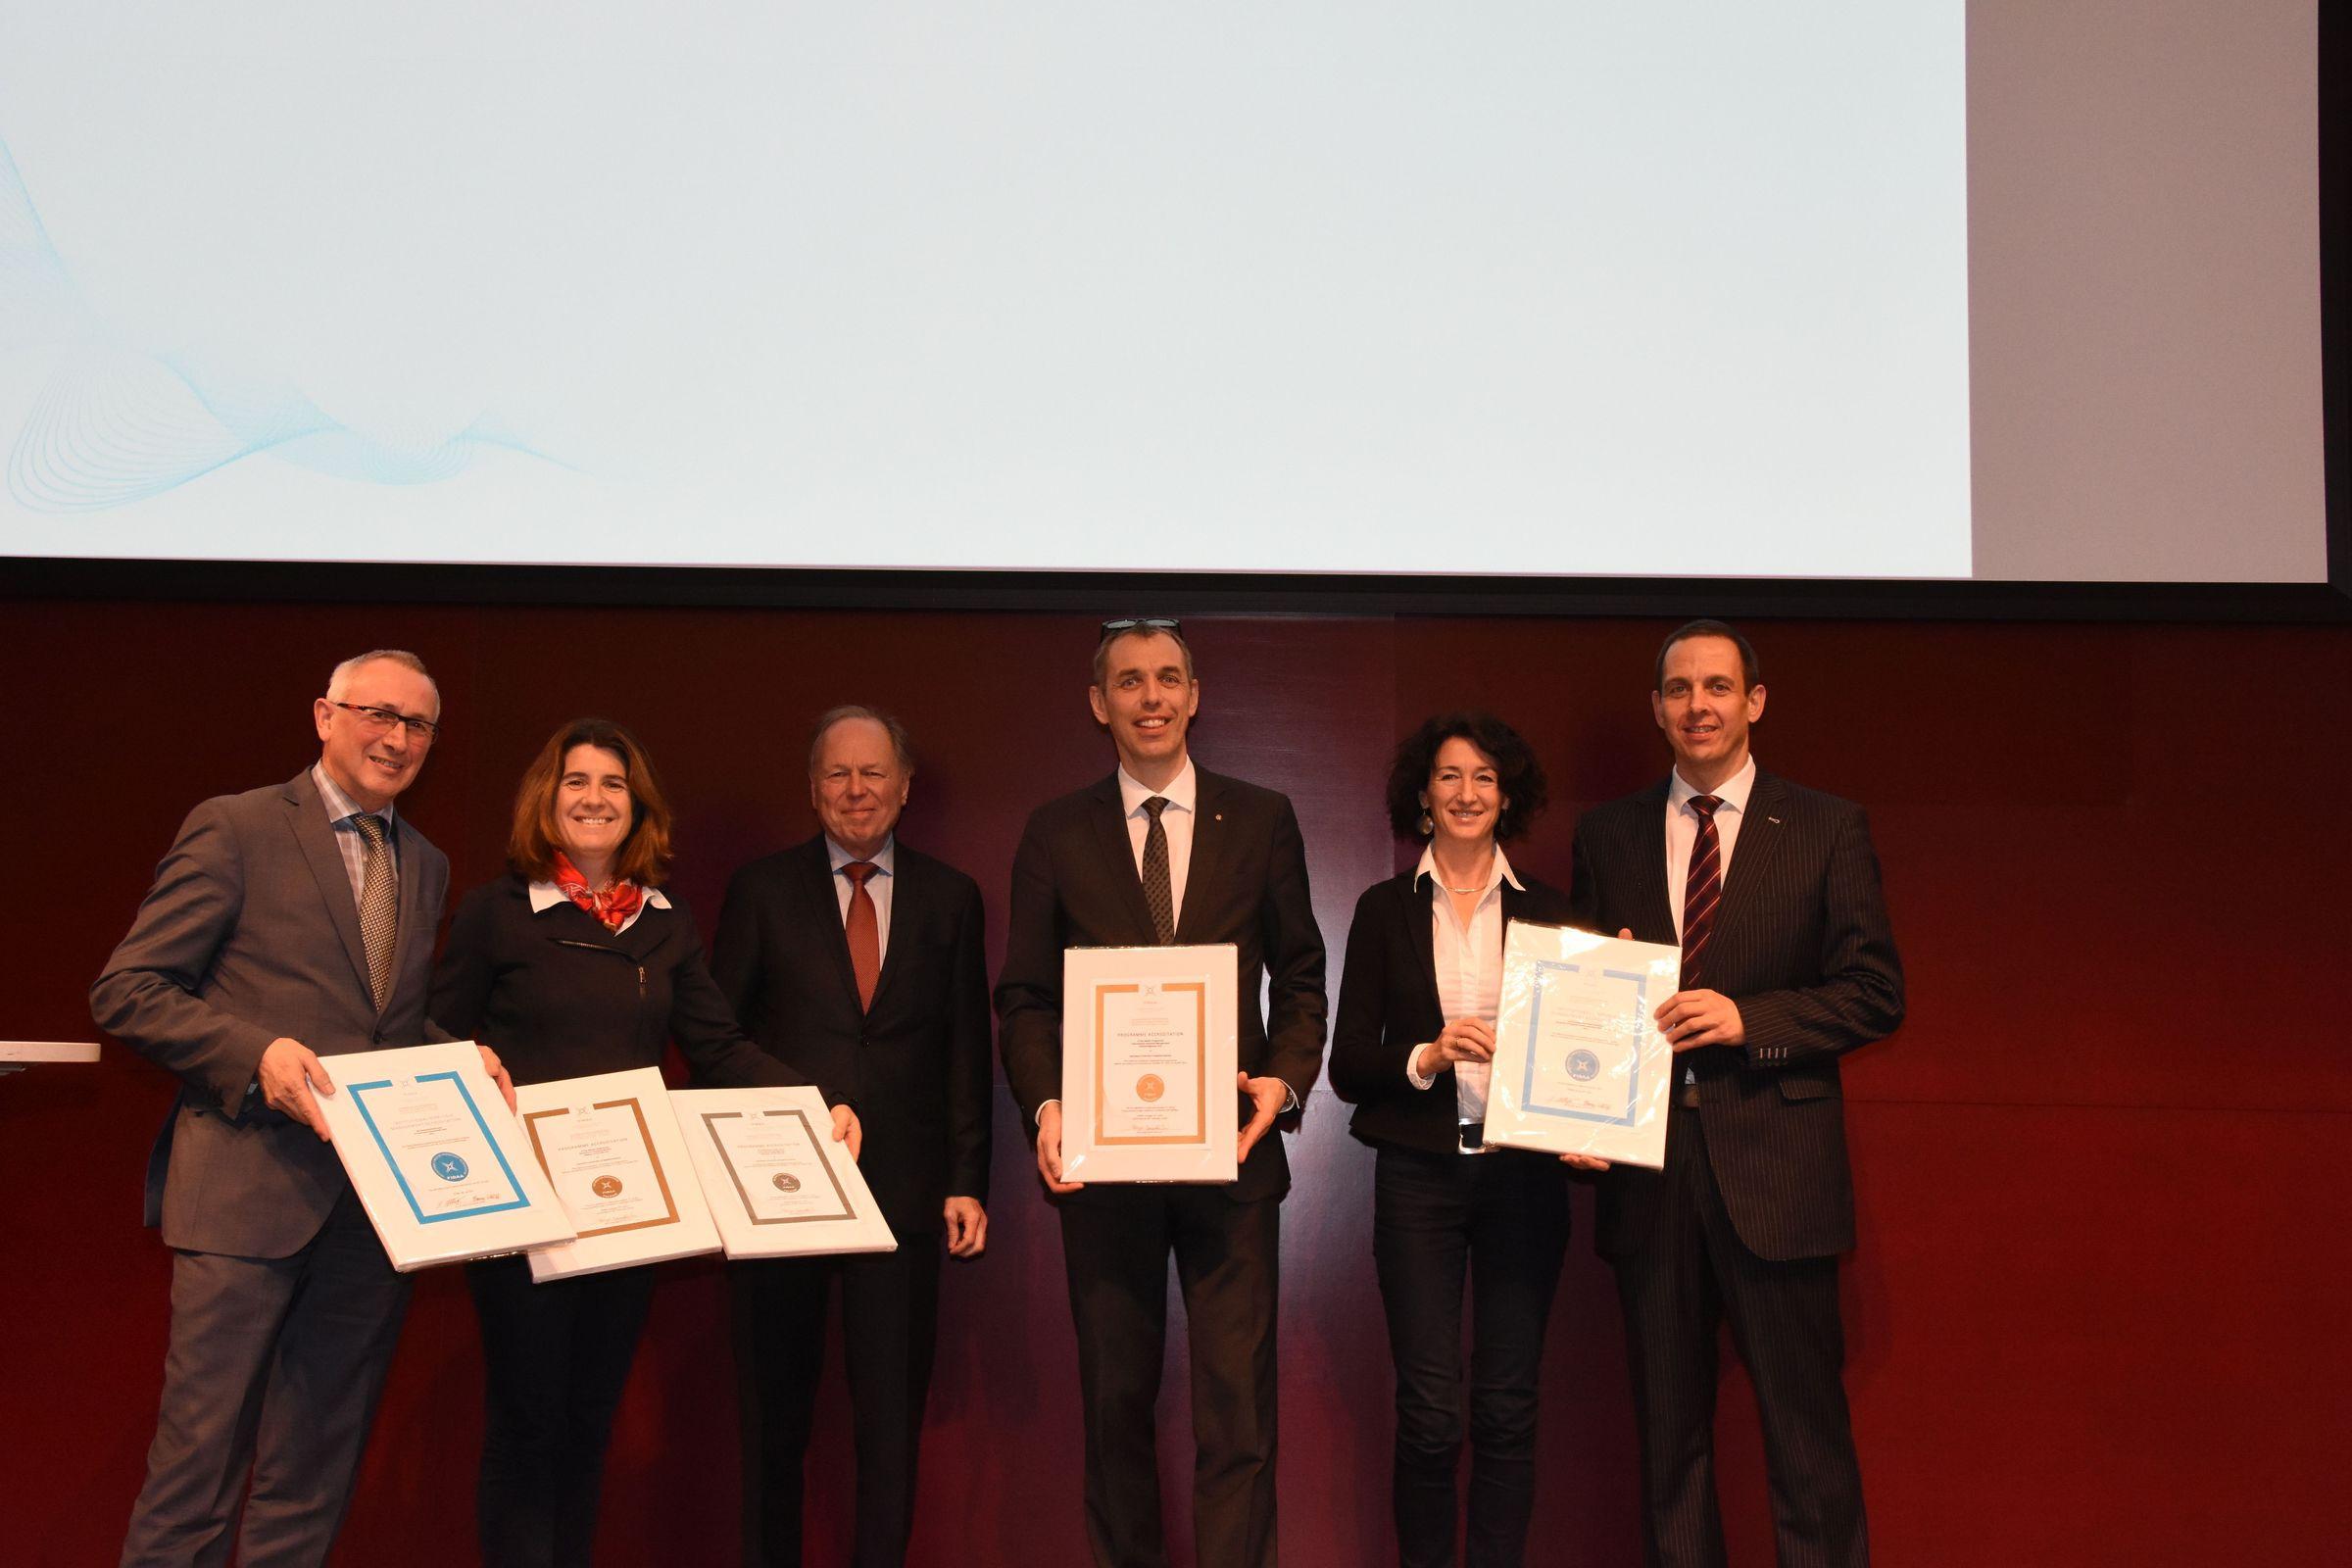 Rektor Karl Peter Pfeiffer; Doris Kiendl-Wendner; Birger Hendriks; Martin Tschandl; Eva Adamer-König, Dieter Vogl.